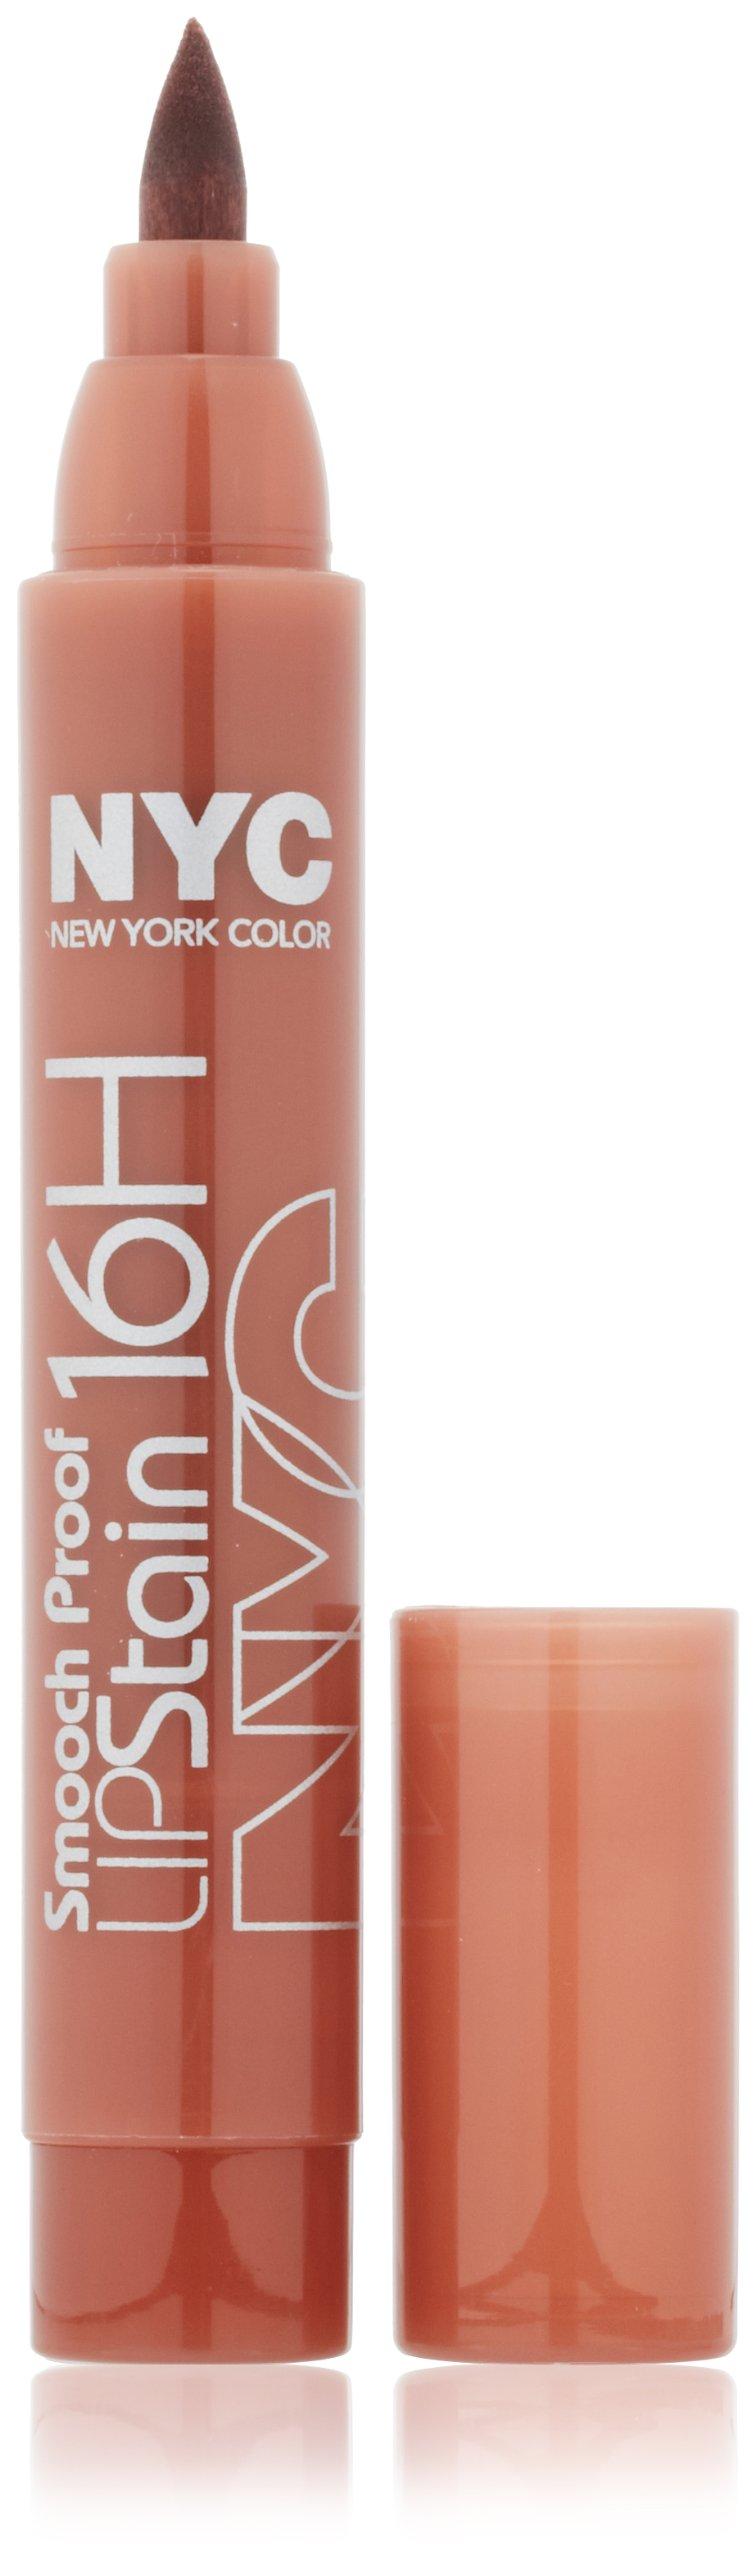 New York Color Smooch Proof Lip Stain, Never Ending Nude, 0.1 Fluid Ounce